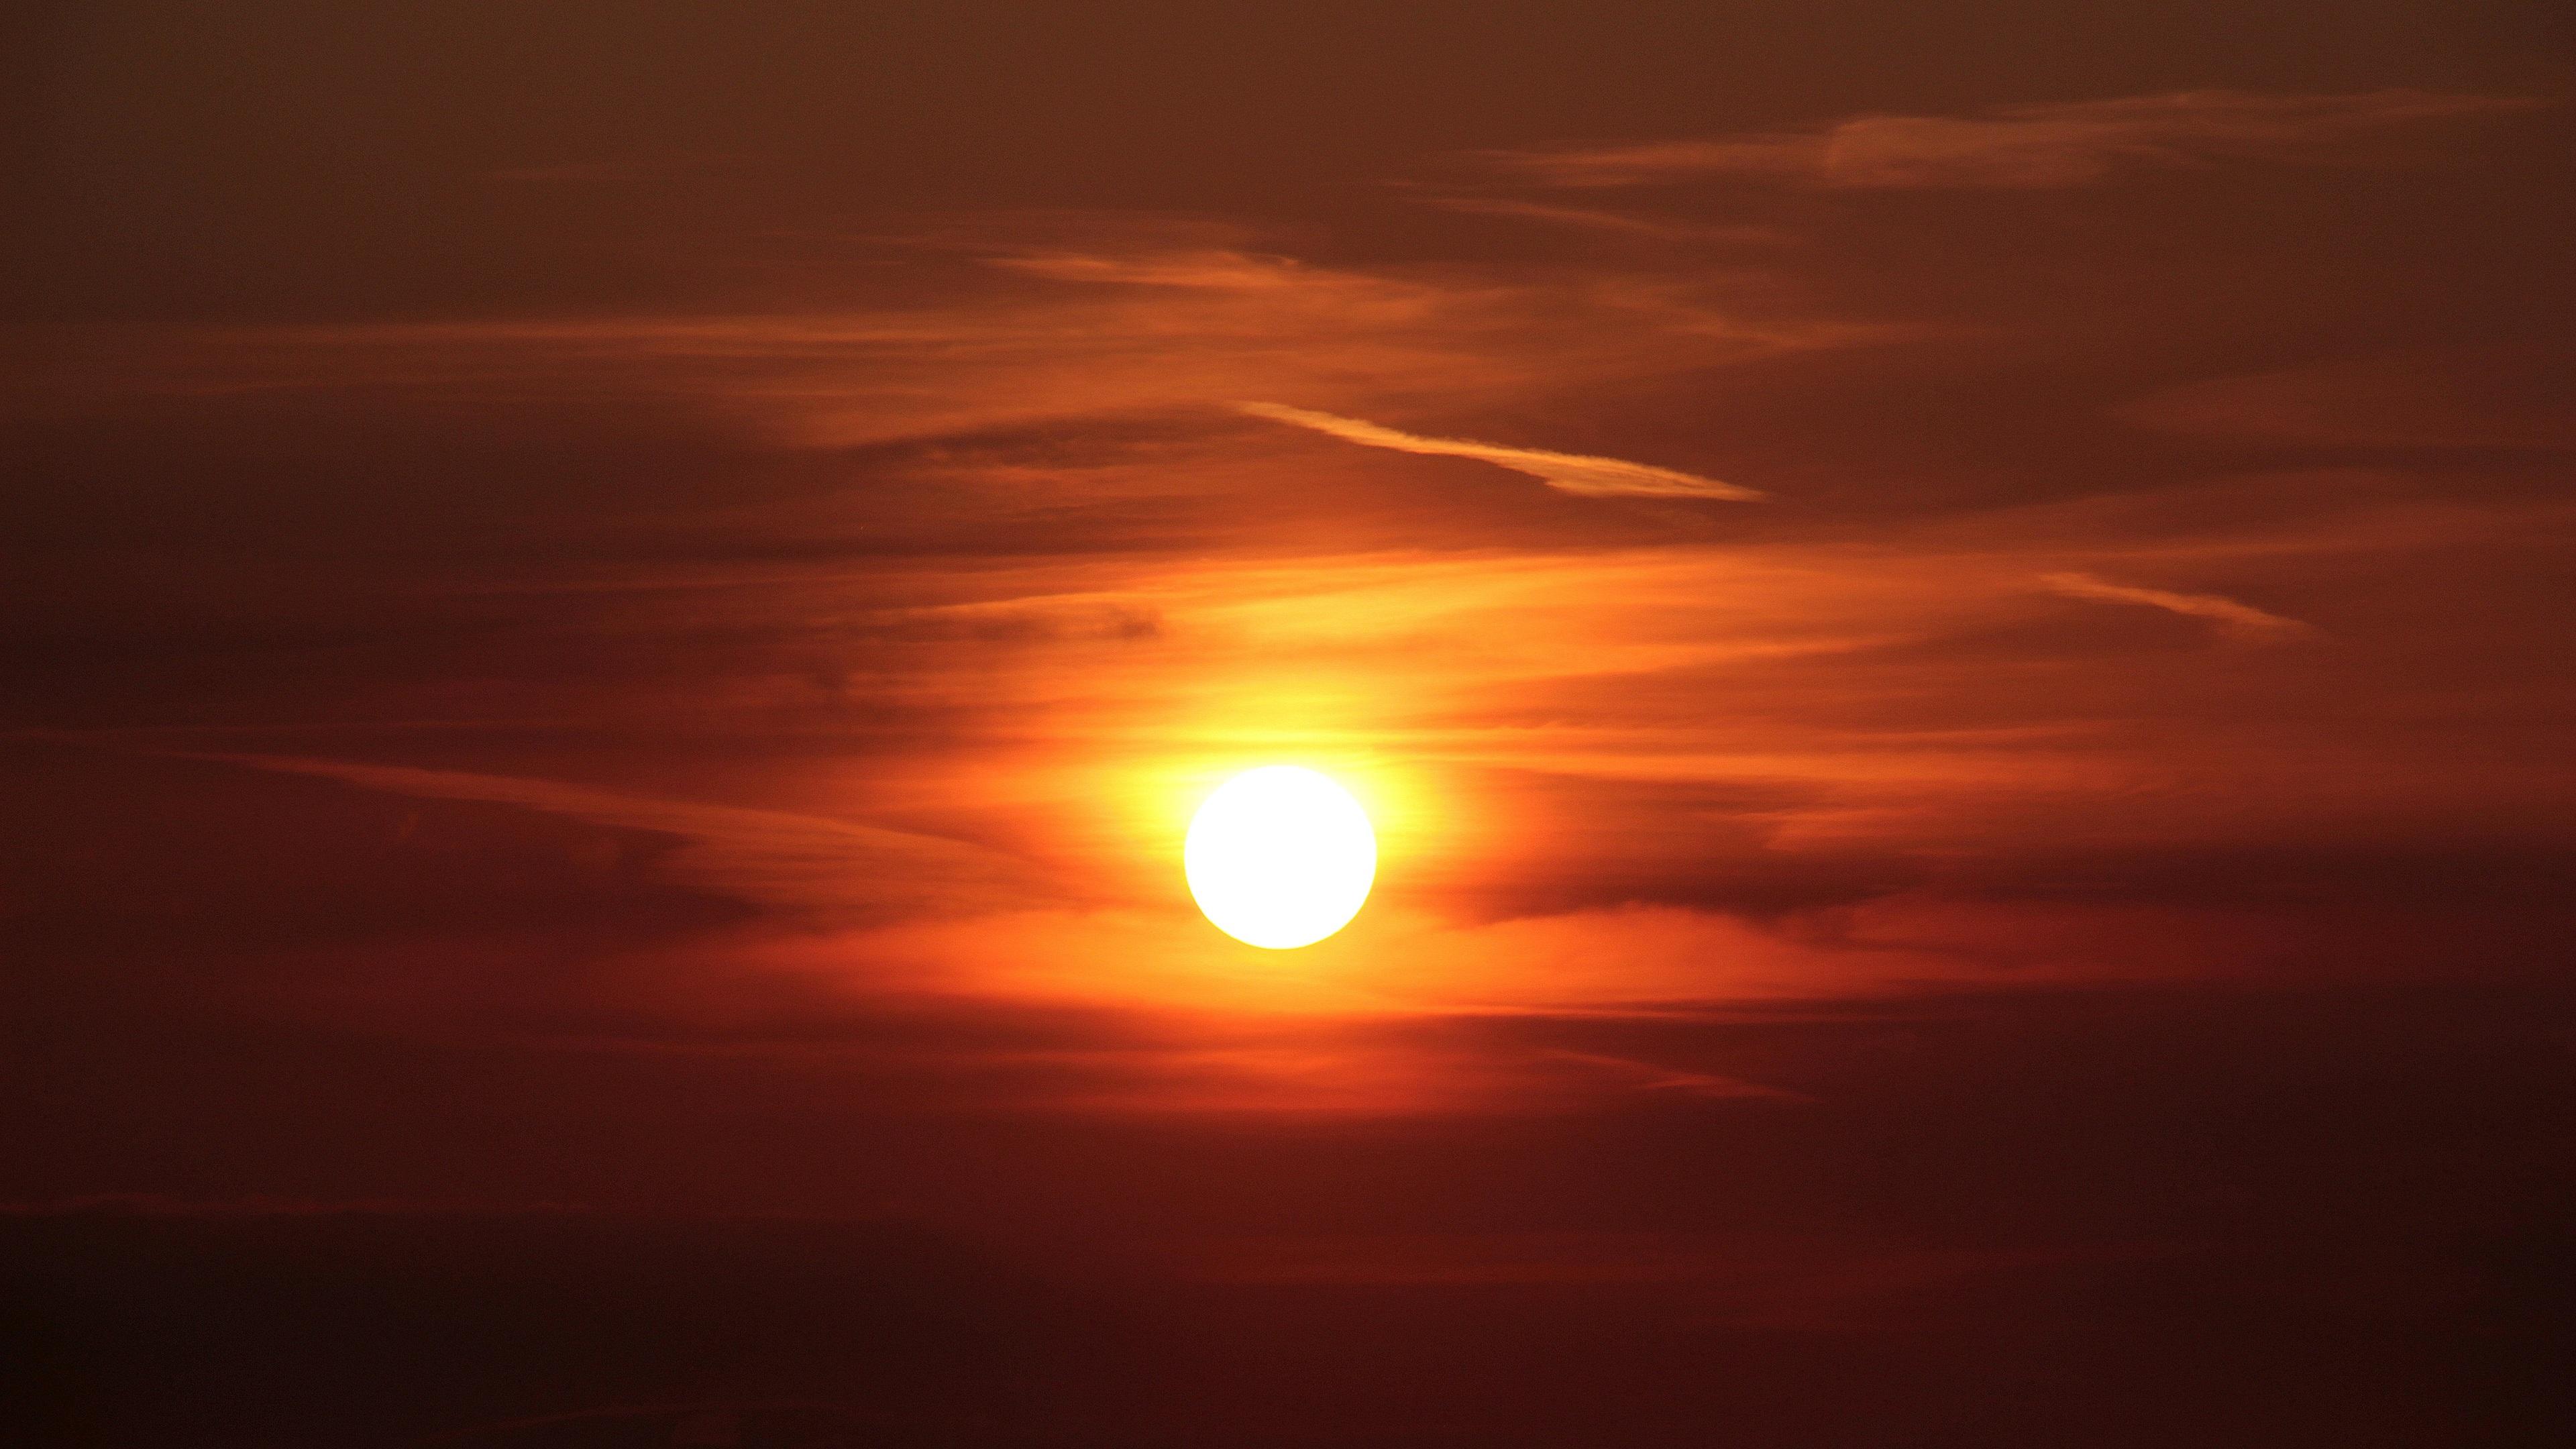 setting sun 1540136618 - Setting Sun - sunset wallpapers, nature wallpapers, hd-wallpapers, 5k wallpapers, 4k-wallpapers